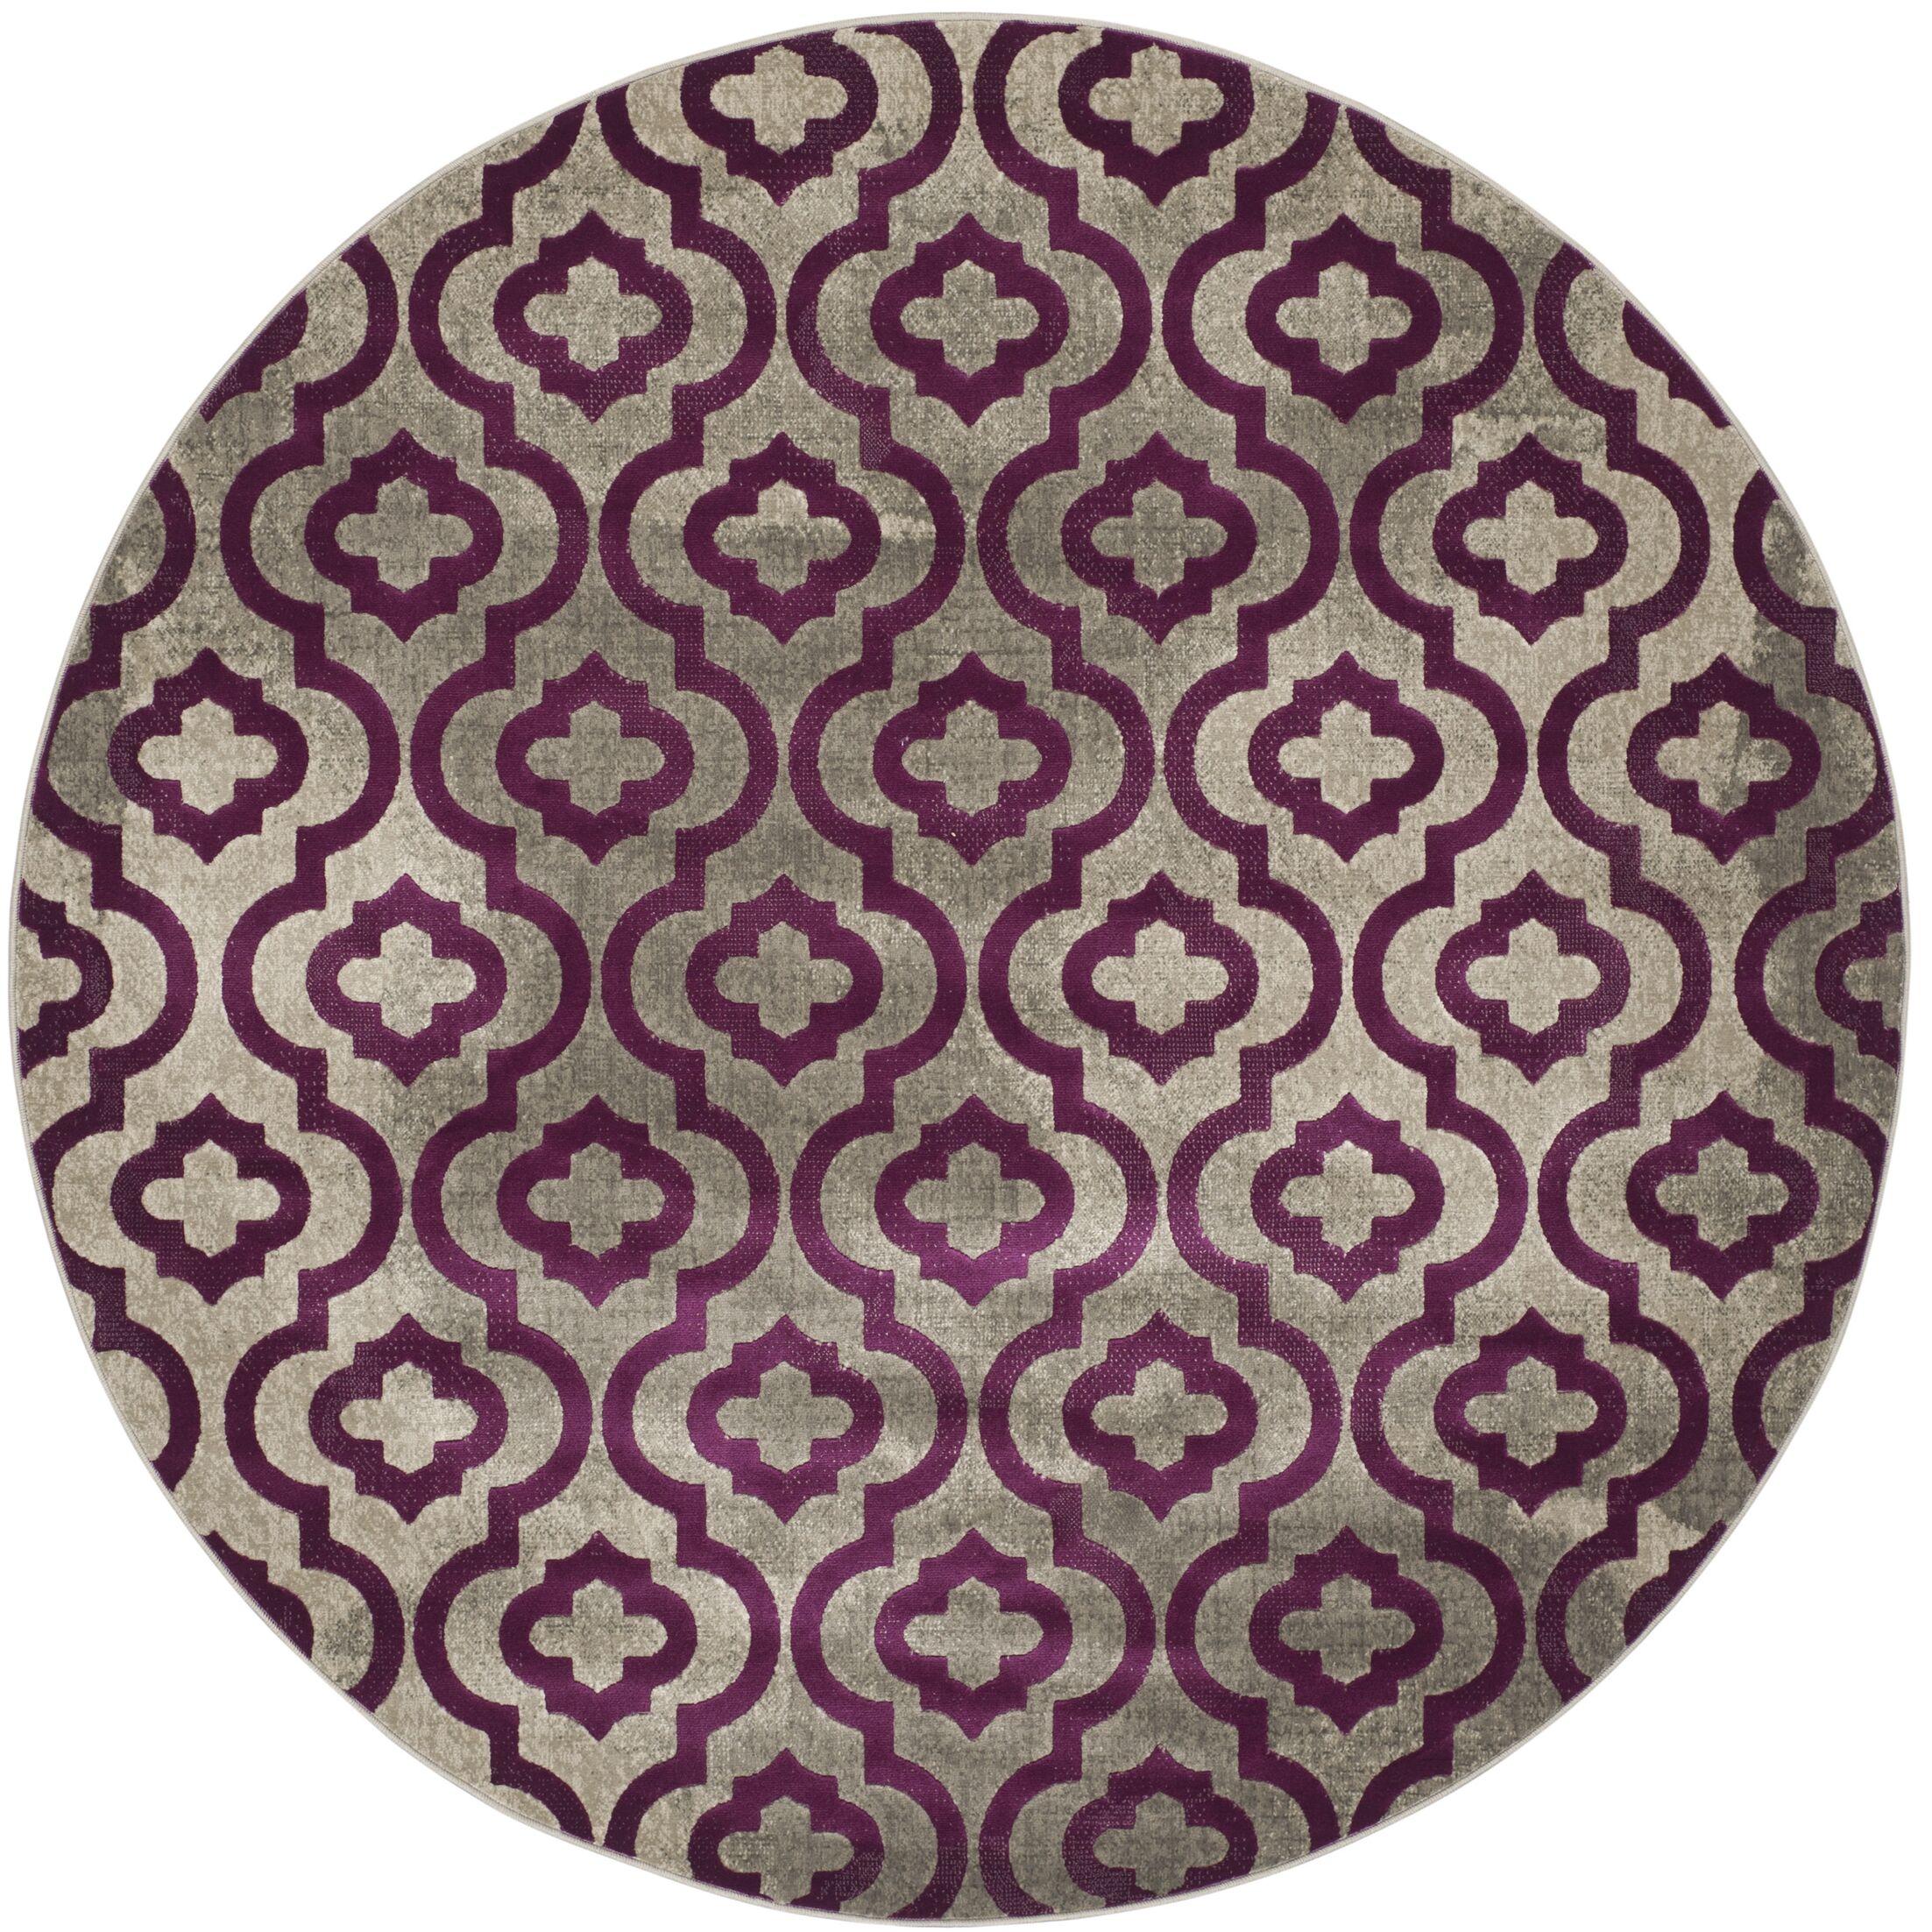 Manorhaven Light Gray/Purple Area Rug Rug Size: Round 6'7